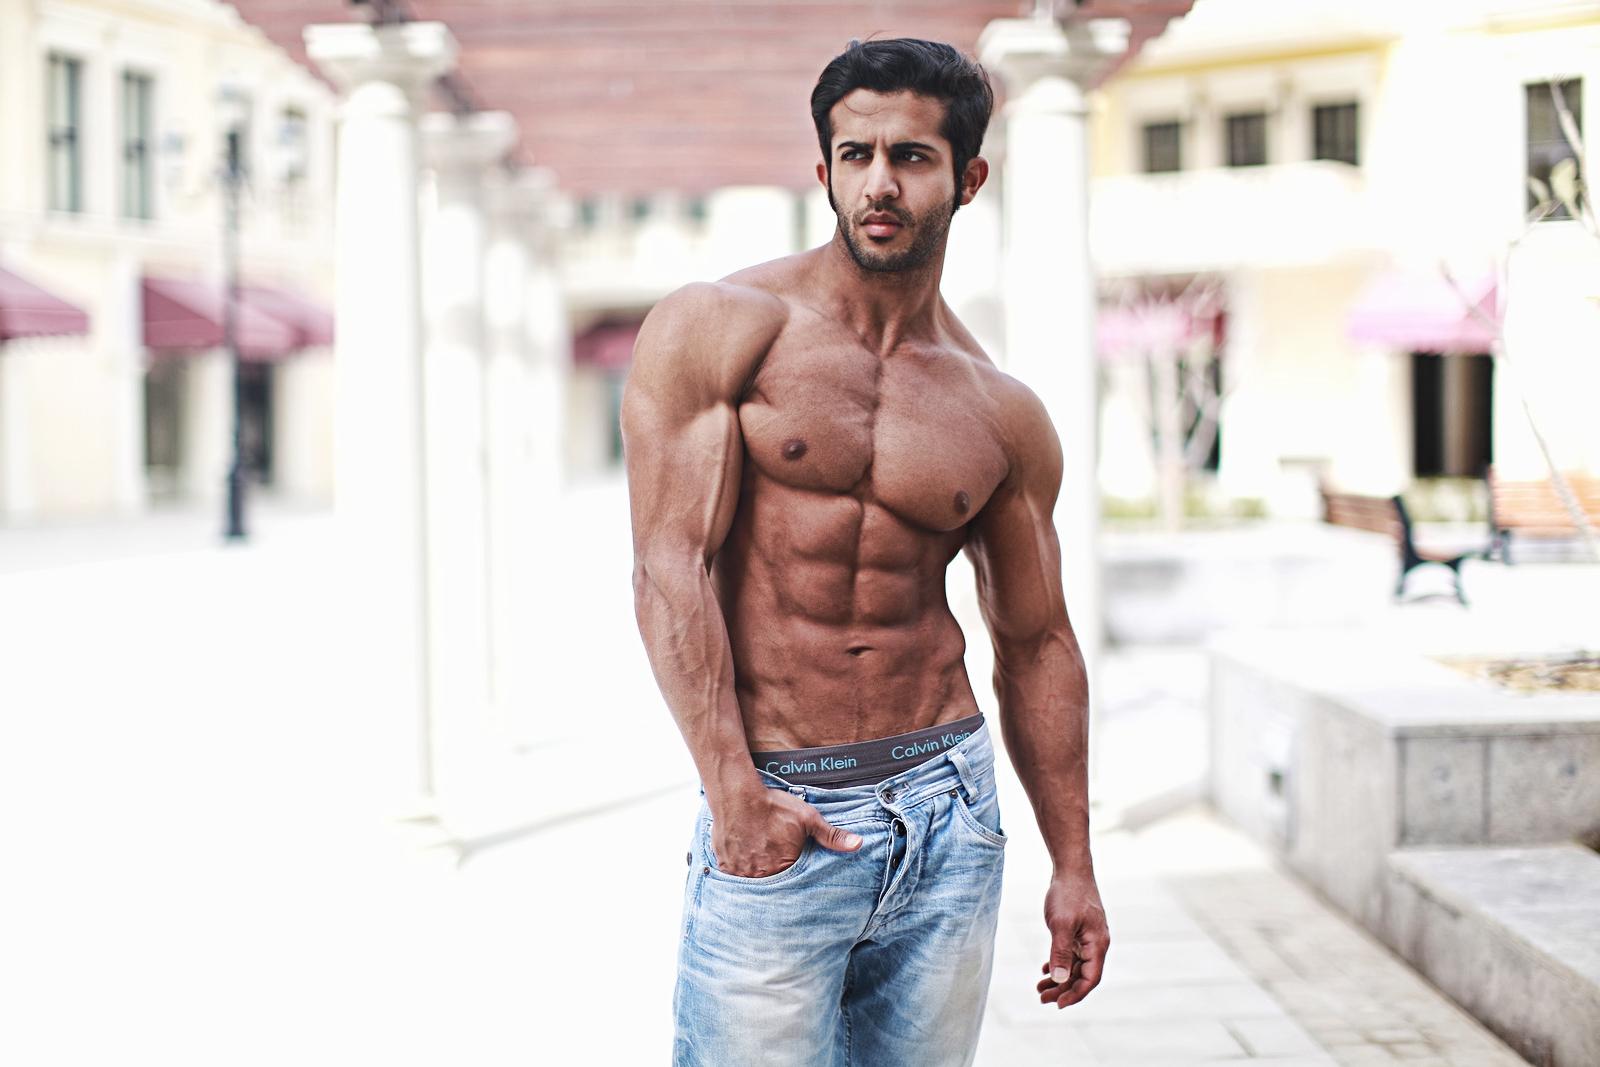 Jabor Al kuwari